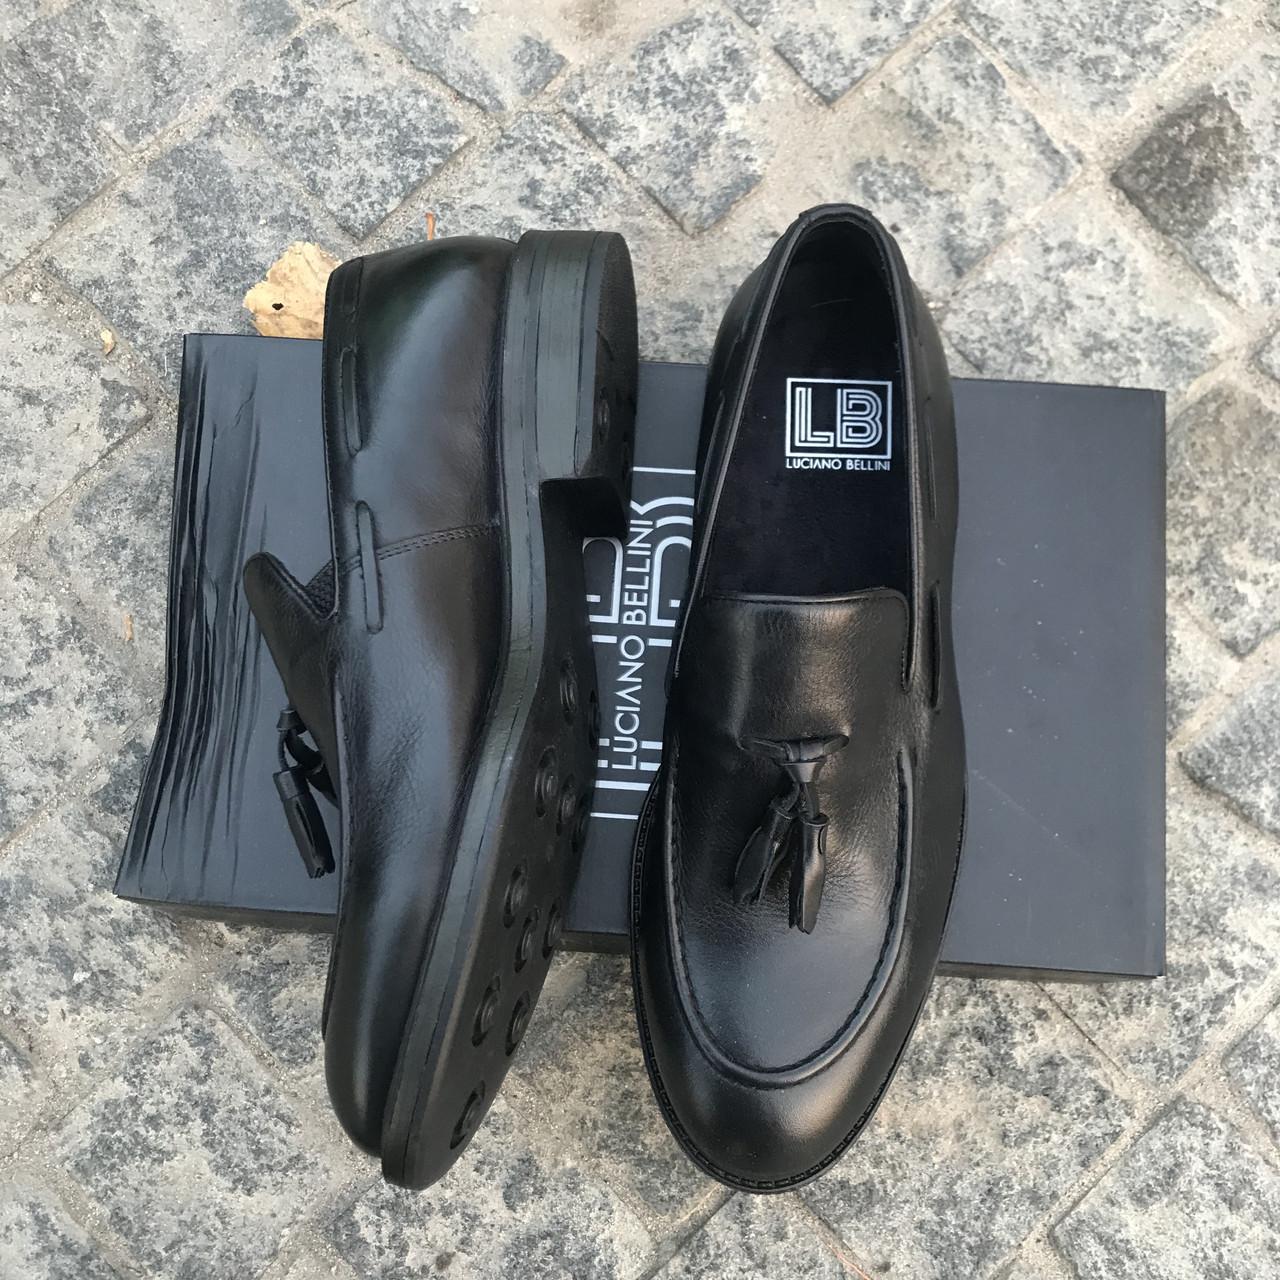 Турецкие мужские кожаные туфли лоферы Luciano Bellini